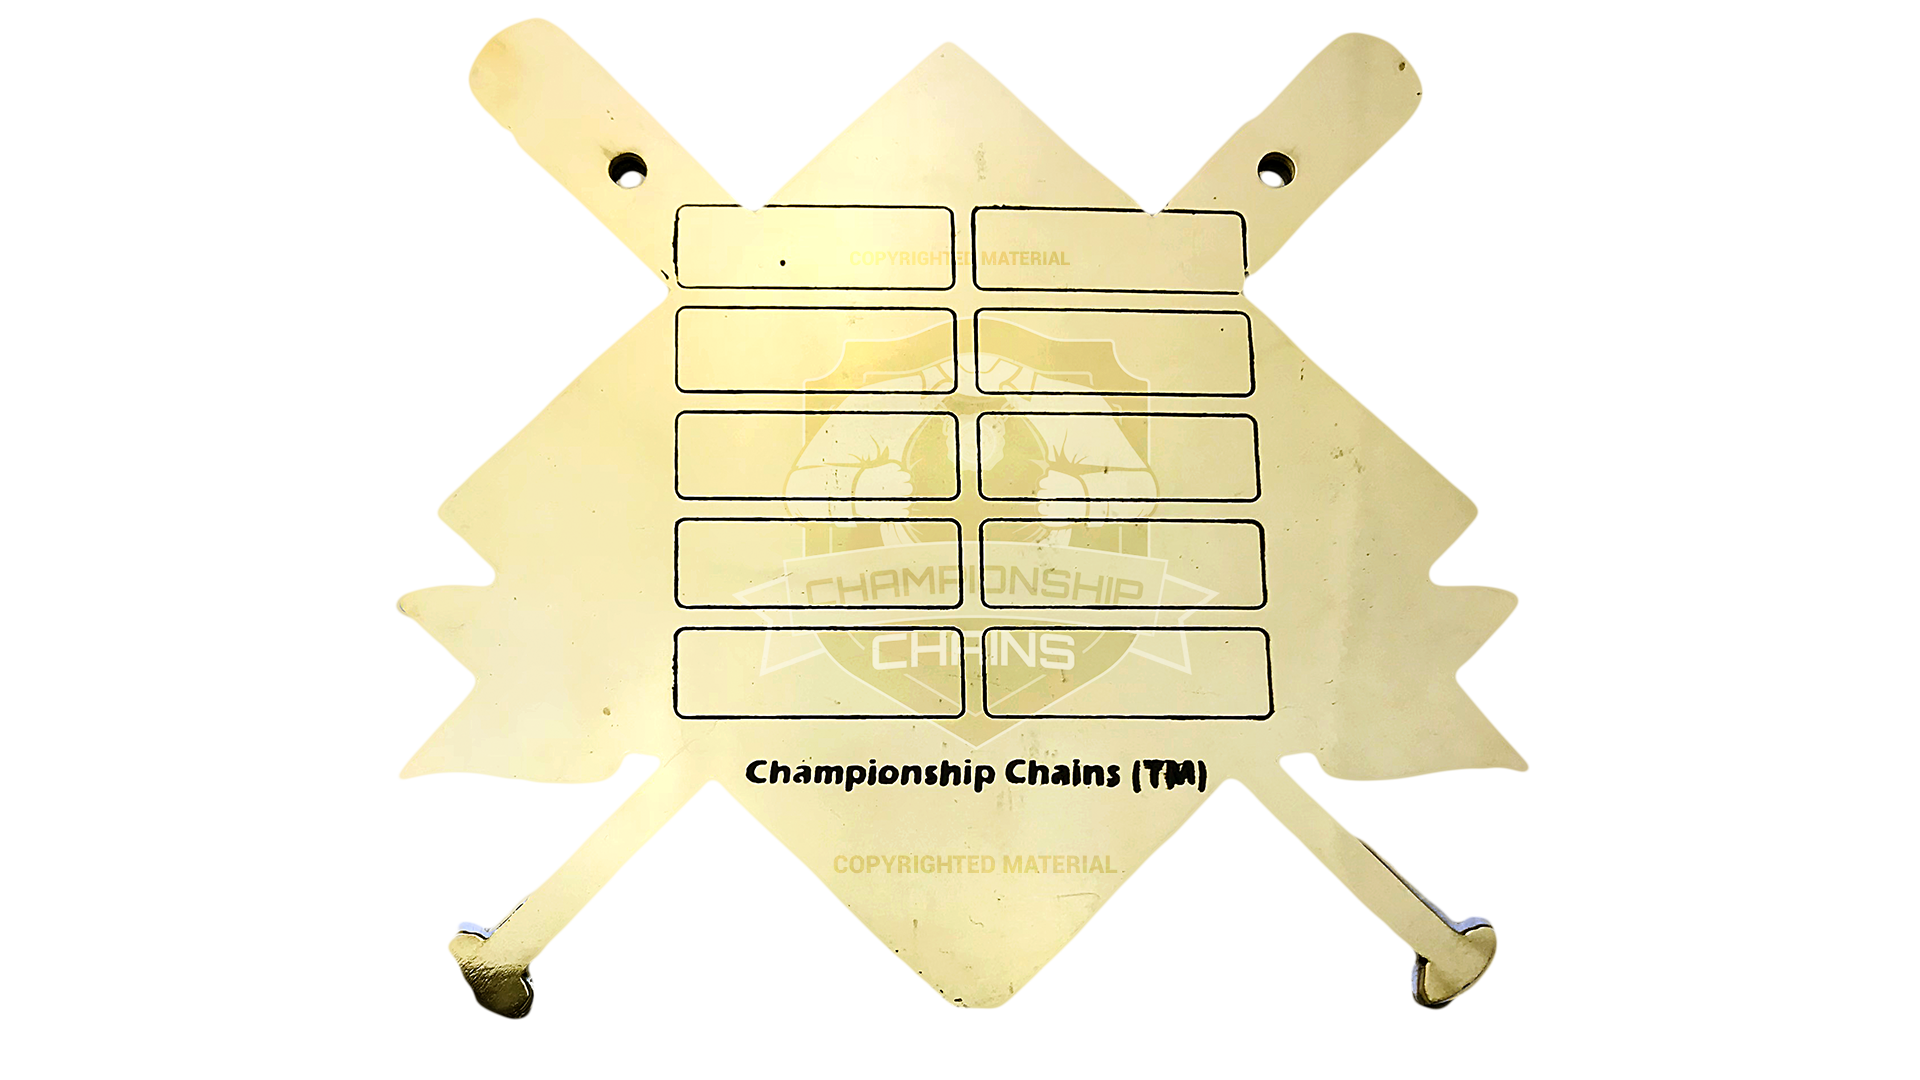 Homerun Baseball Championship Chain customized championship chain image